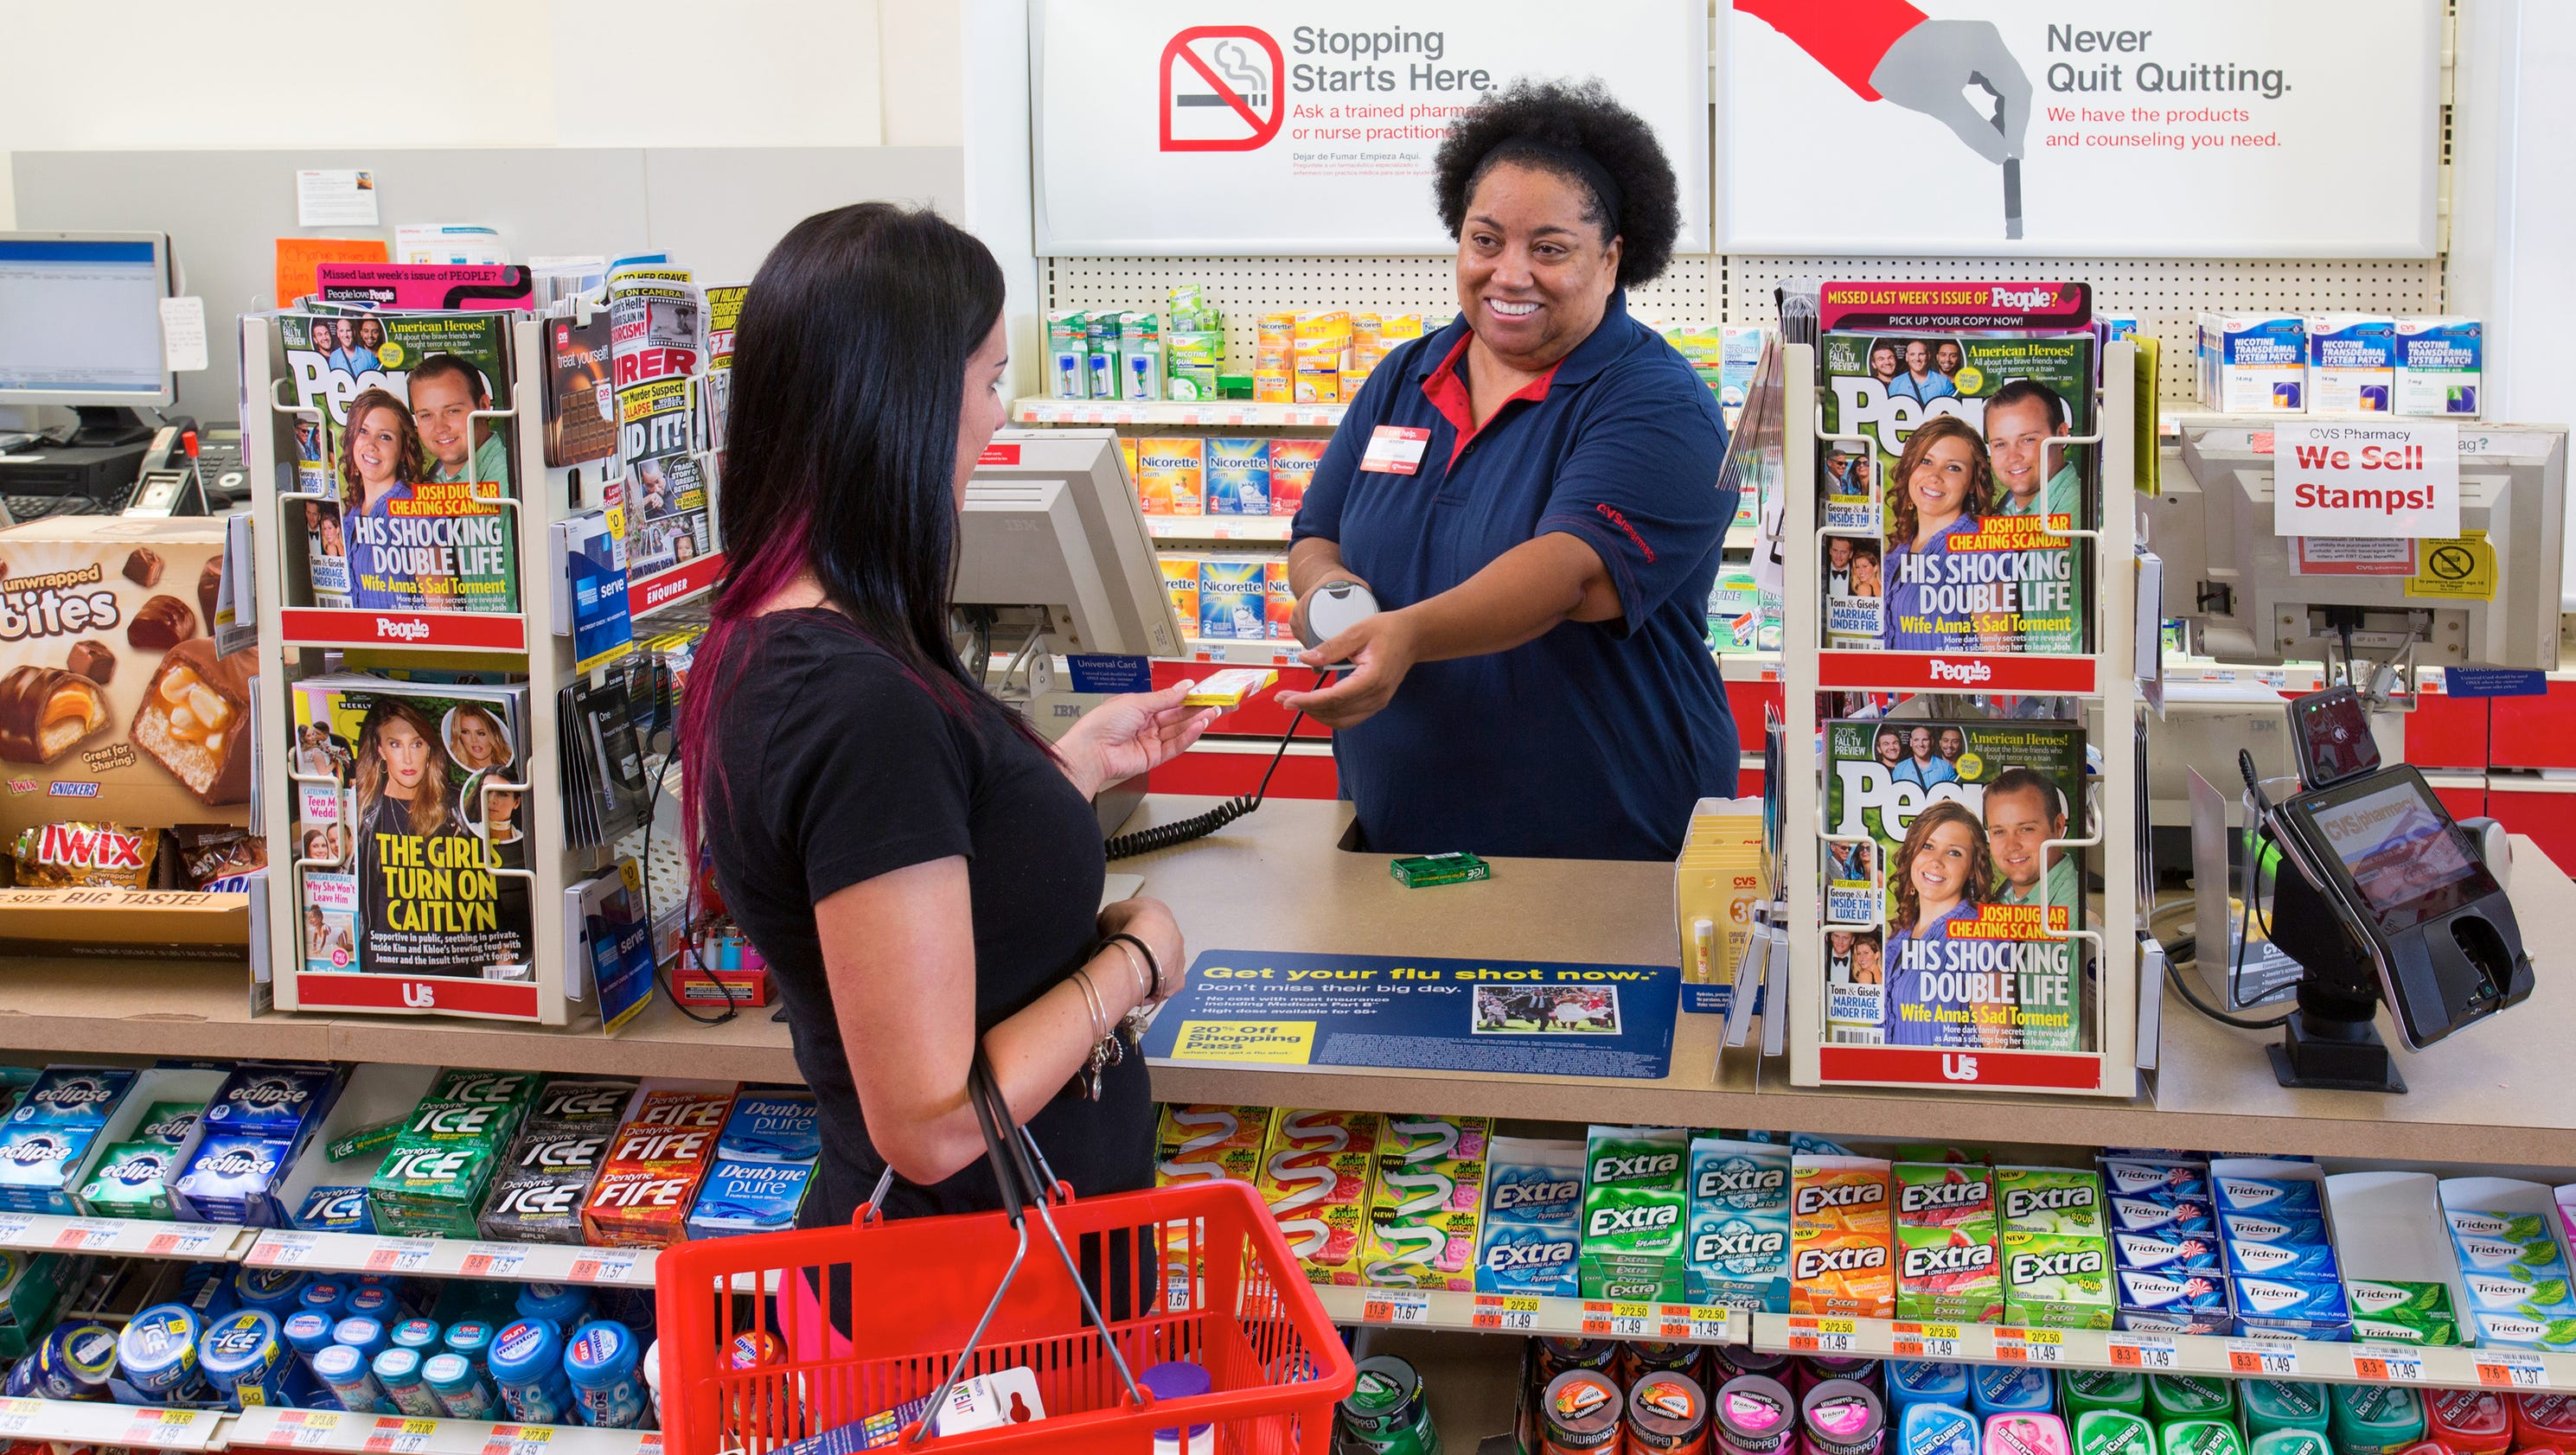 cvs sale paper Complete coverage of cvs pharmacy black friday 2018 ads & cvs pharmacy black friday deals info.